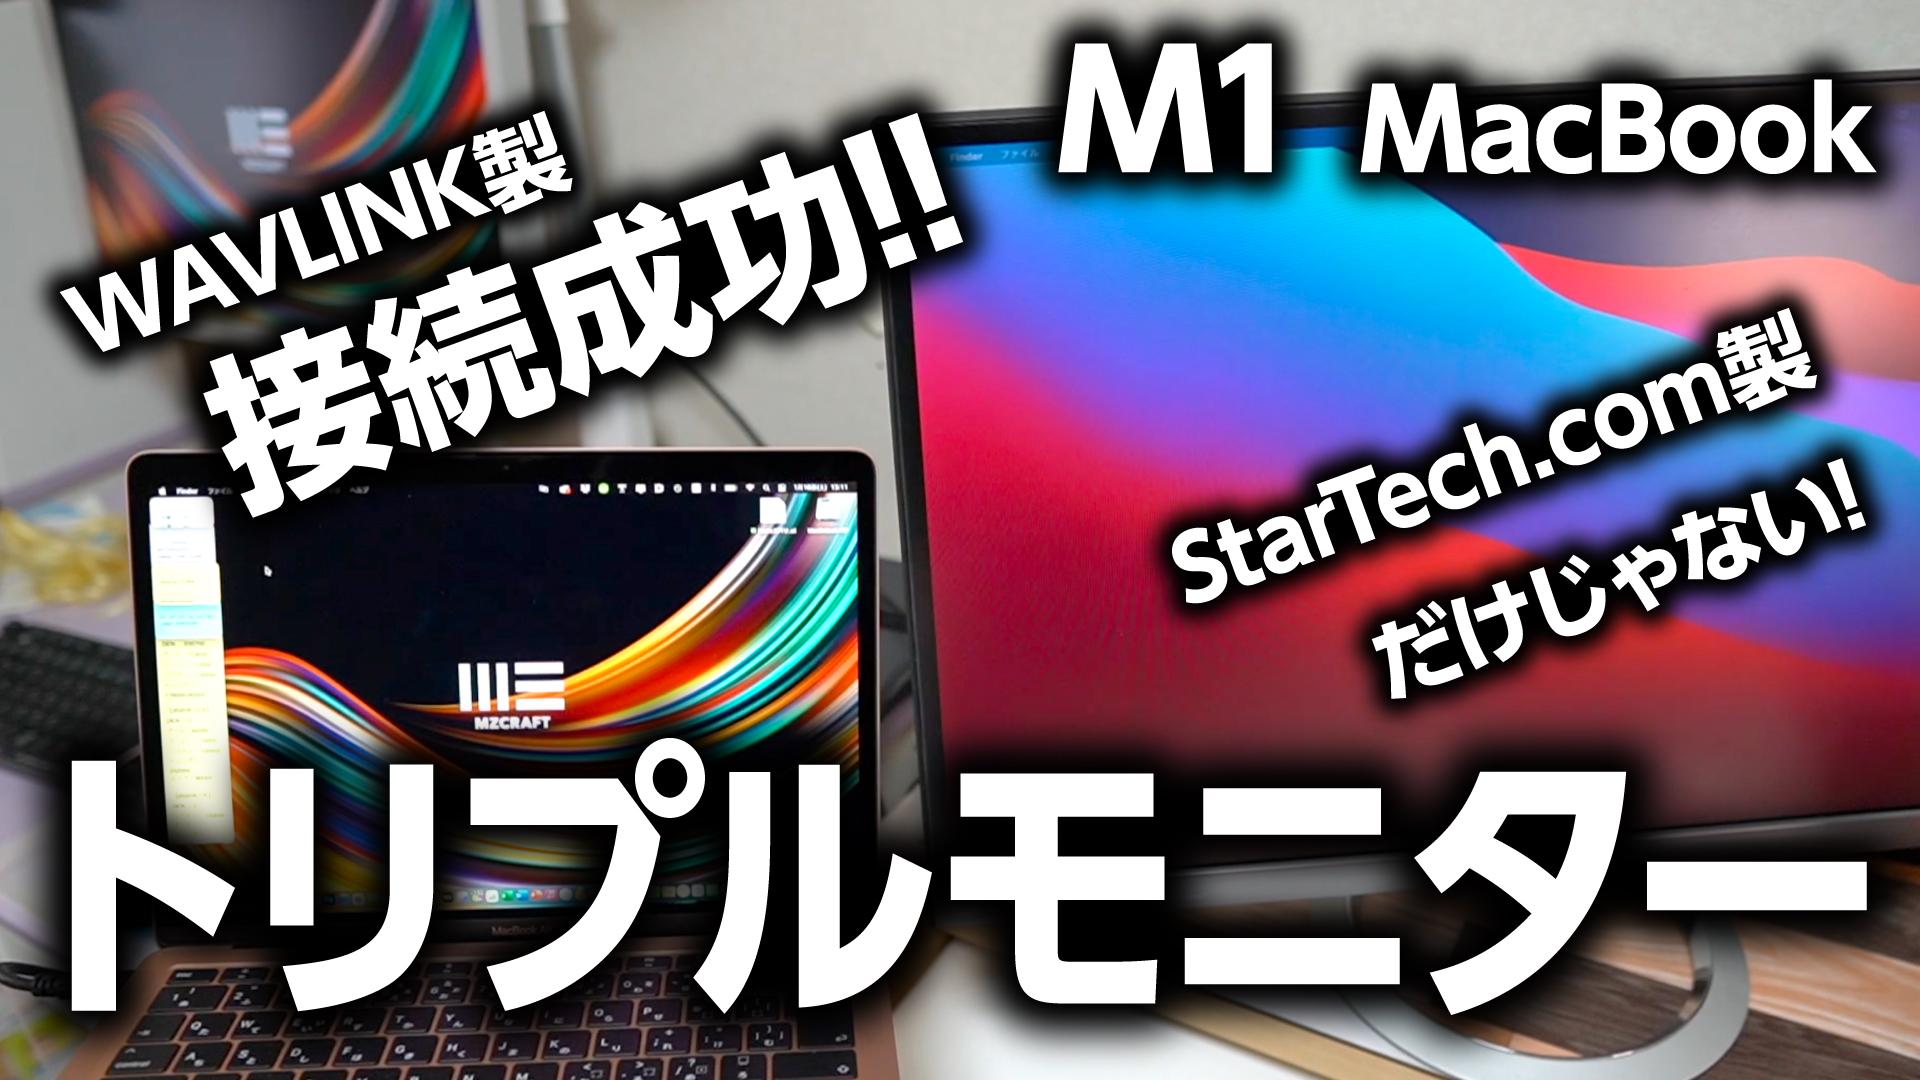 "<span class=""title"">接続成功! M1 MacBook 外部モニター(トリプルディスプレイ) WAVLINK DisplayLink</span>"